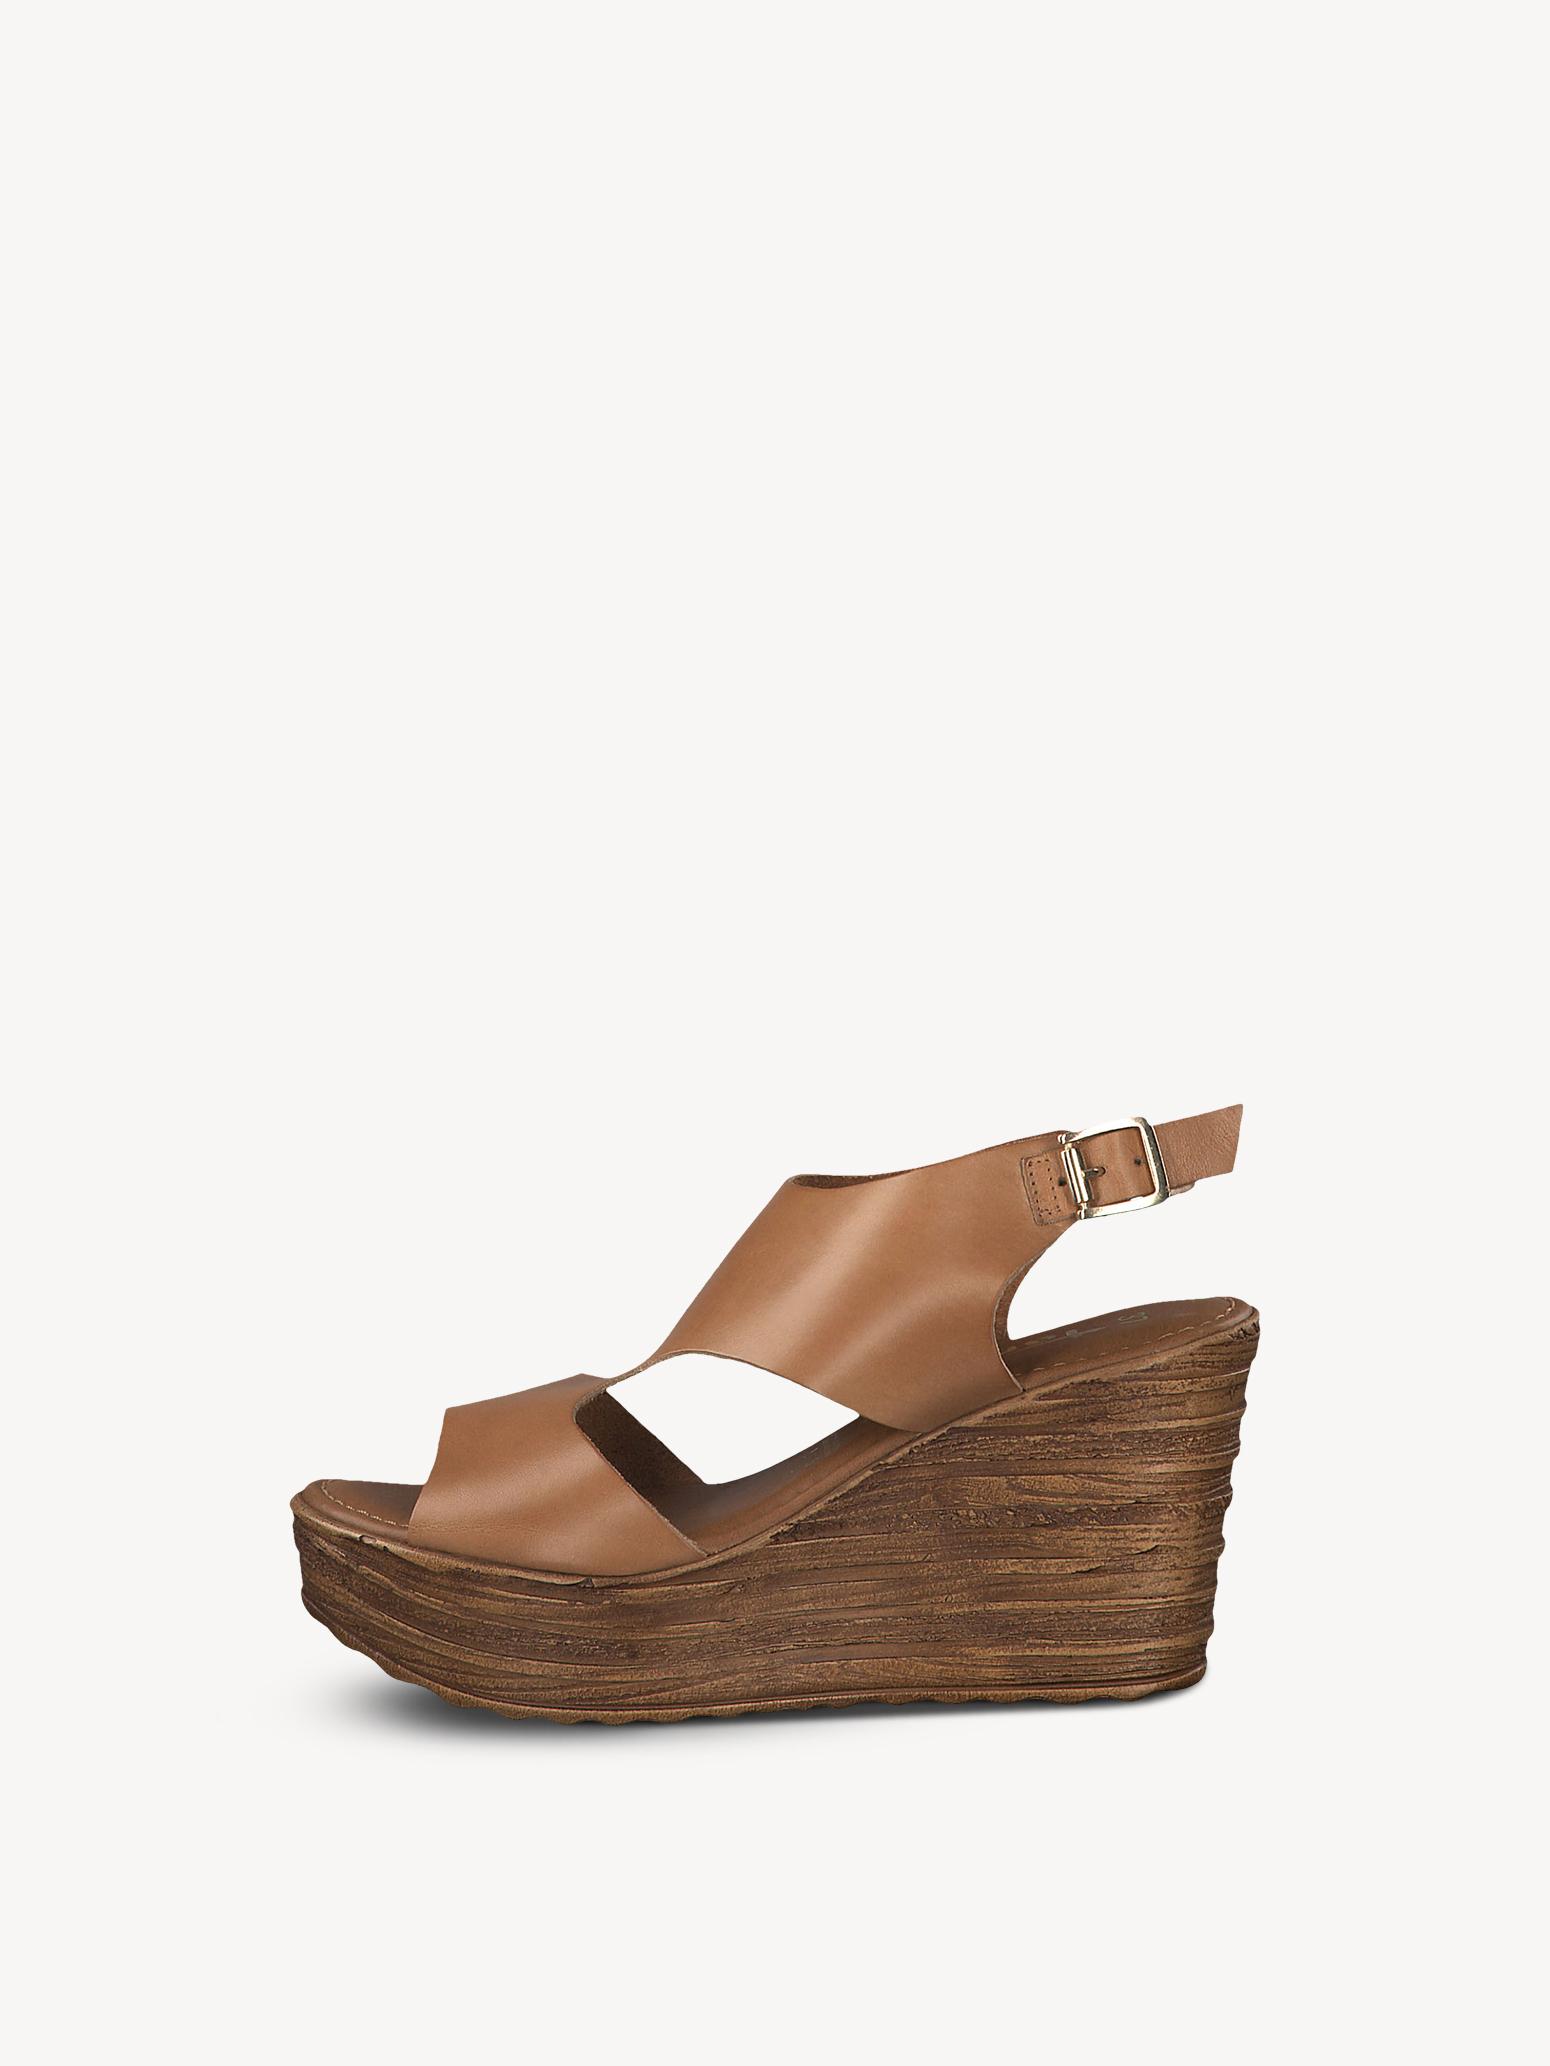 billig tamaris sandalen gold, Tamaris stiefel pepper damen